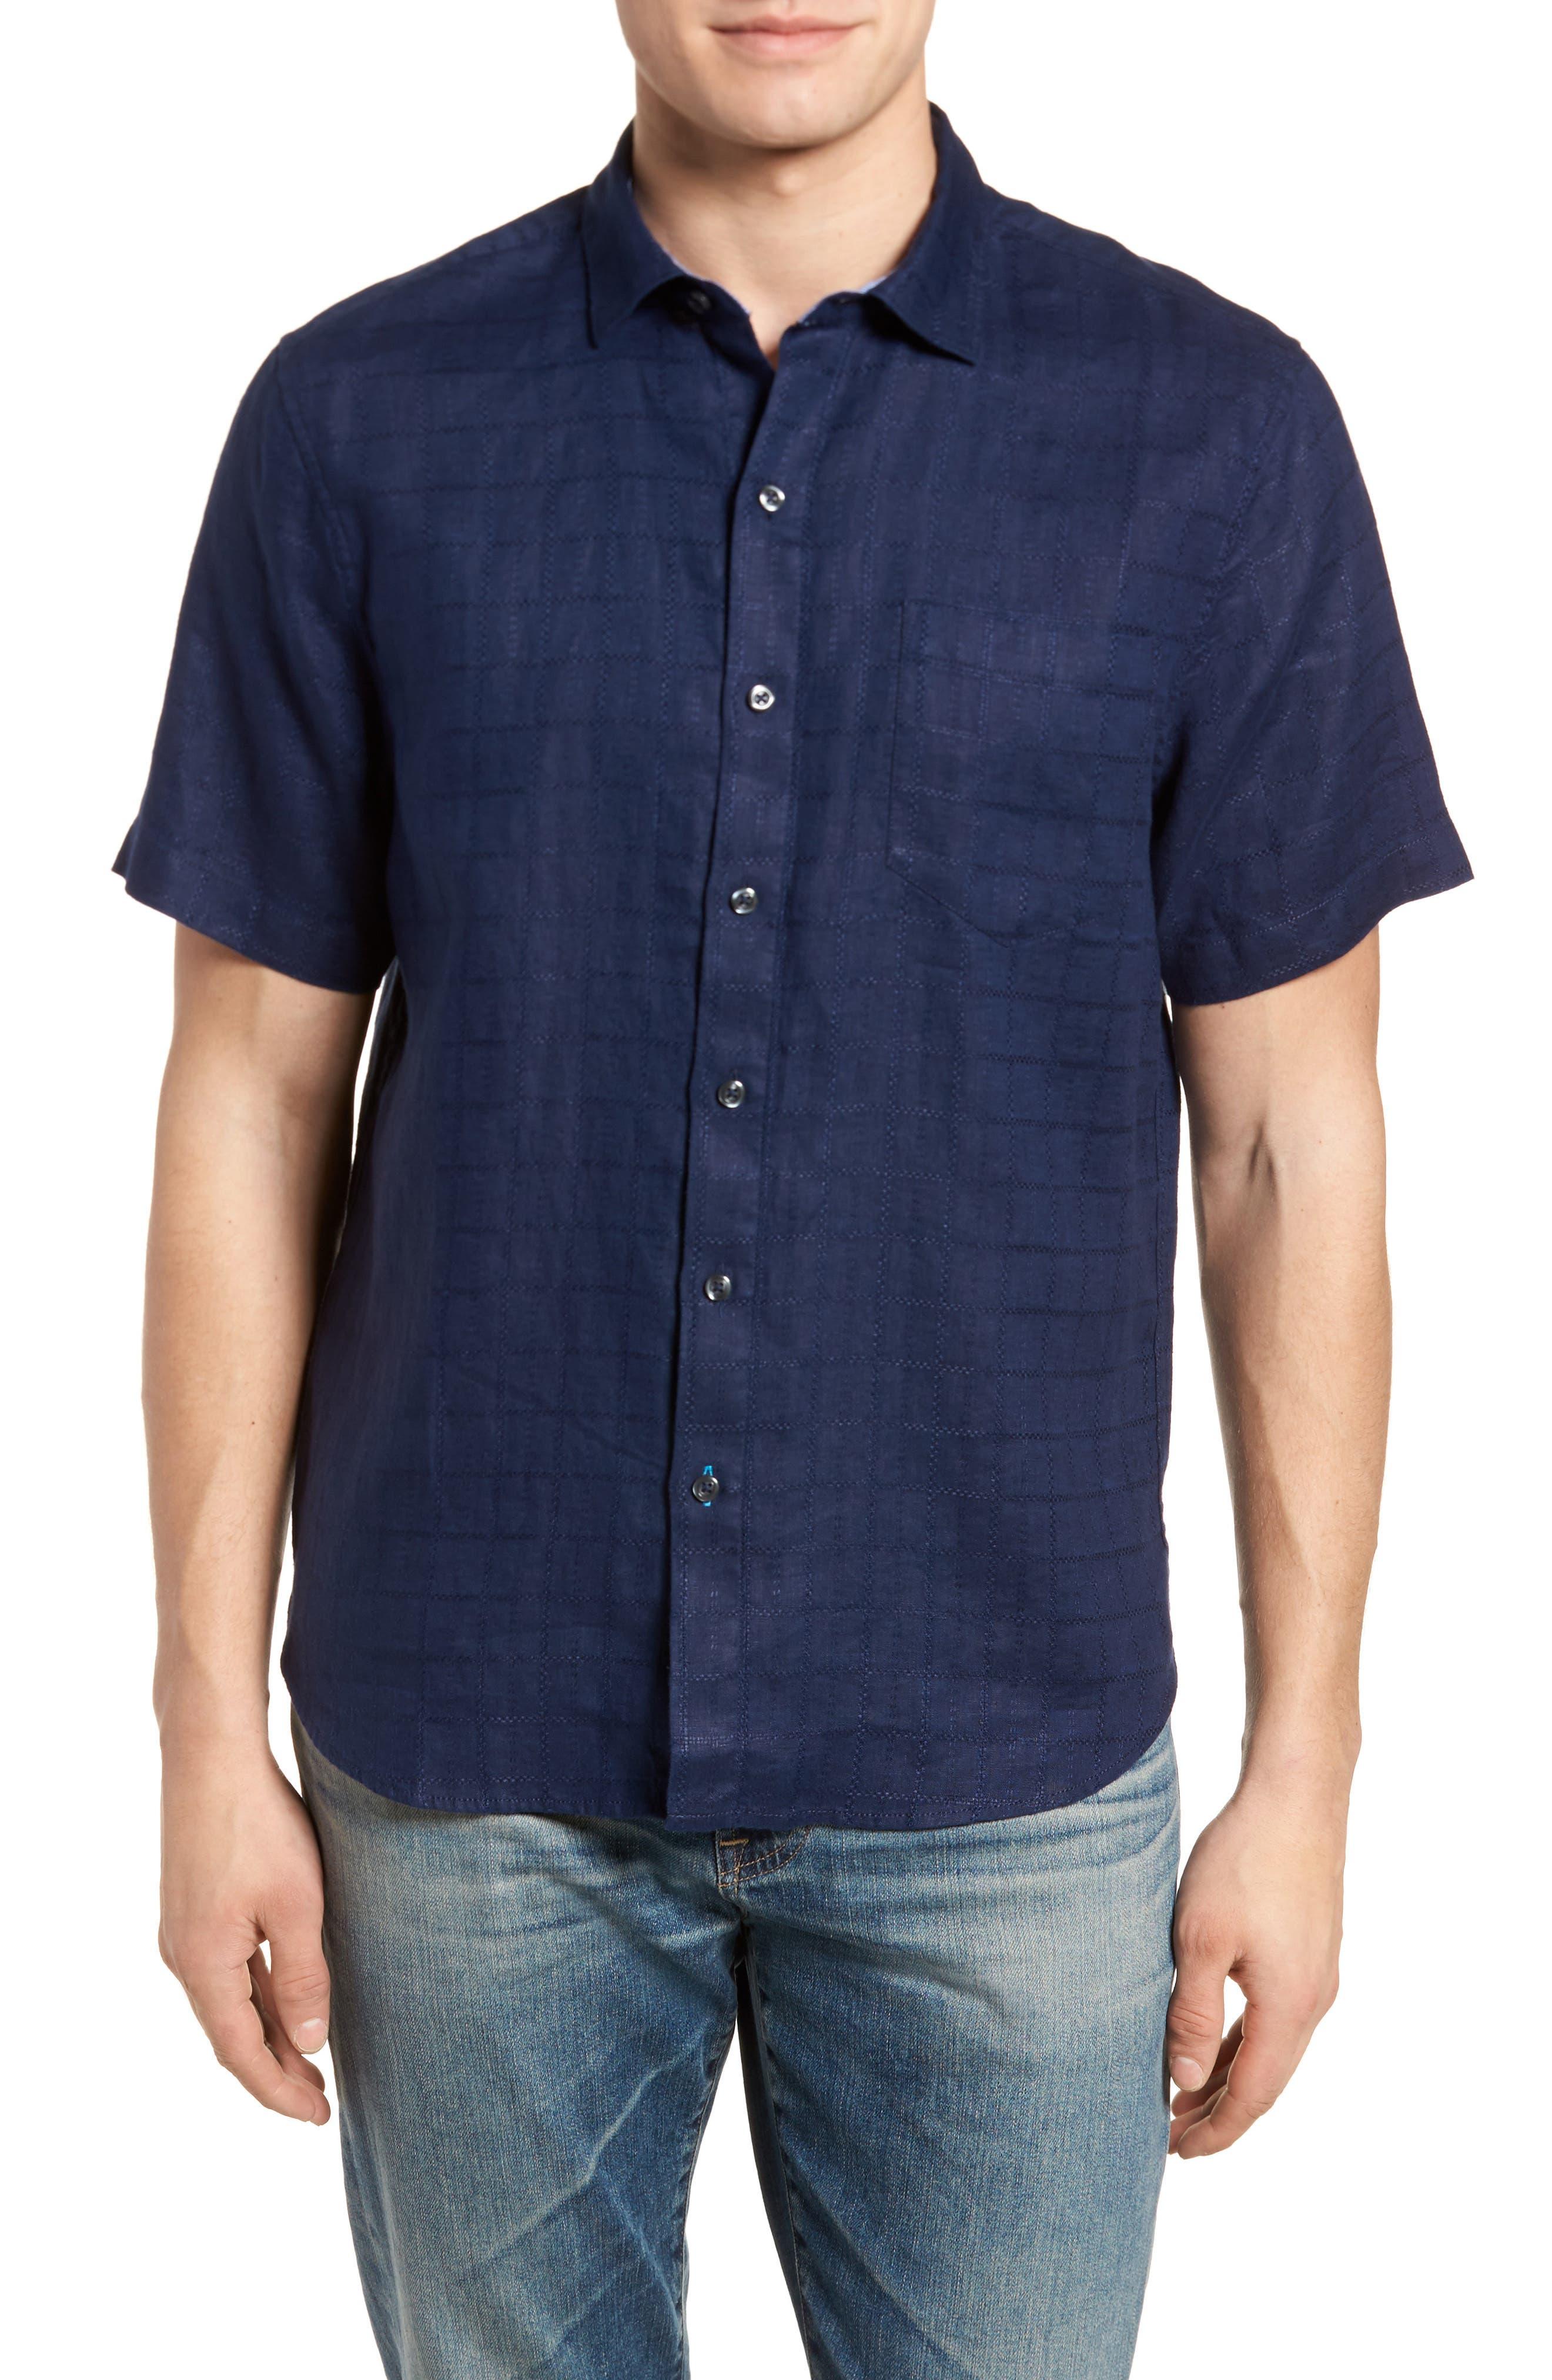 Main Image - Tommy Bahama Costa Sera Linen Sport Shirt